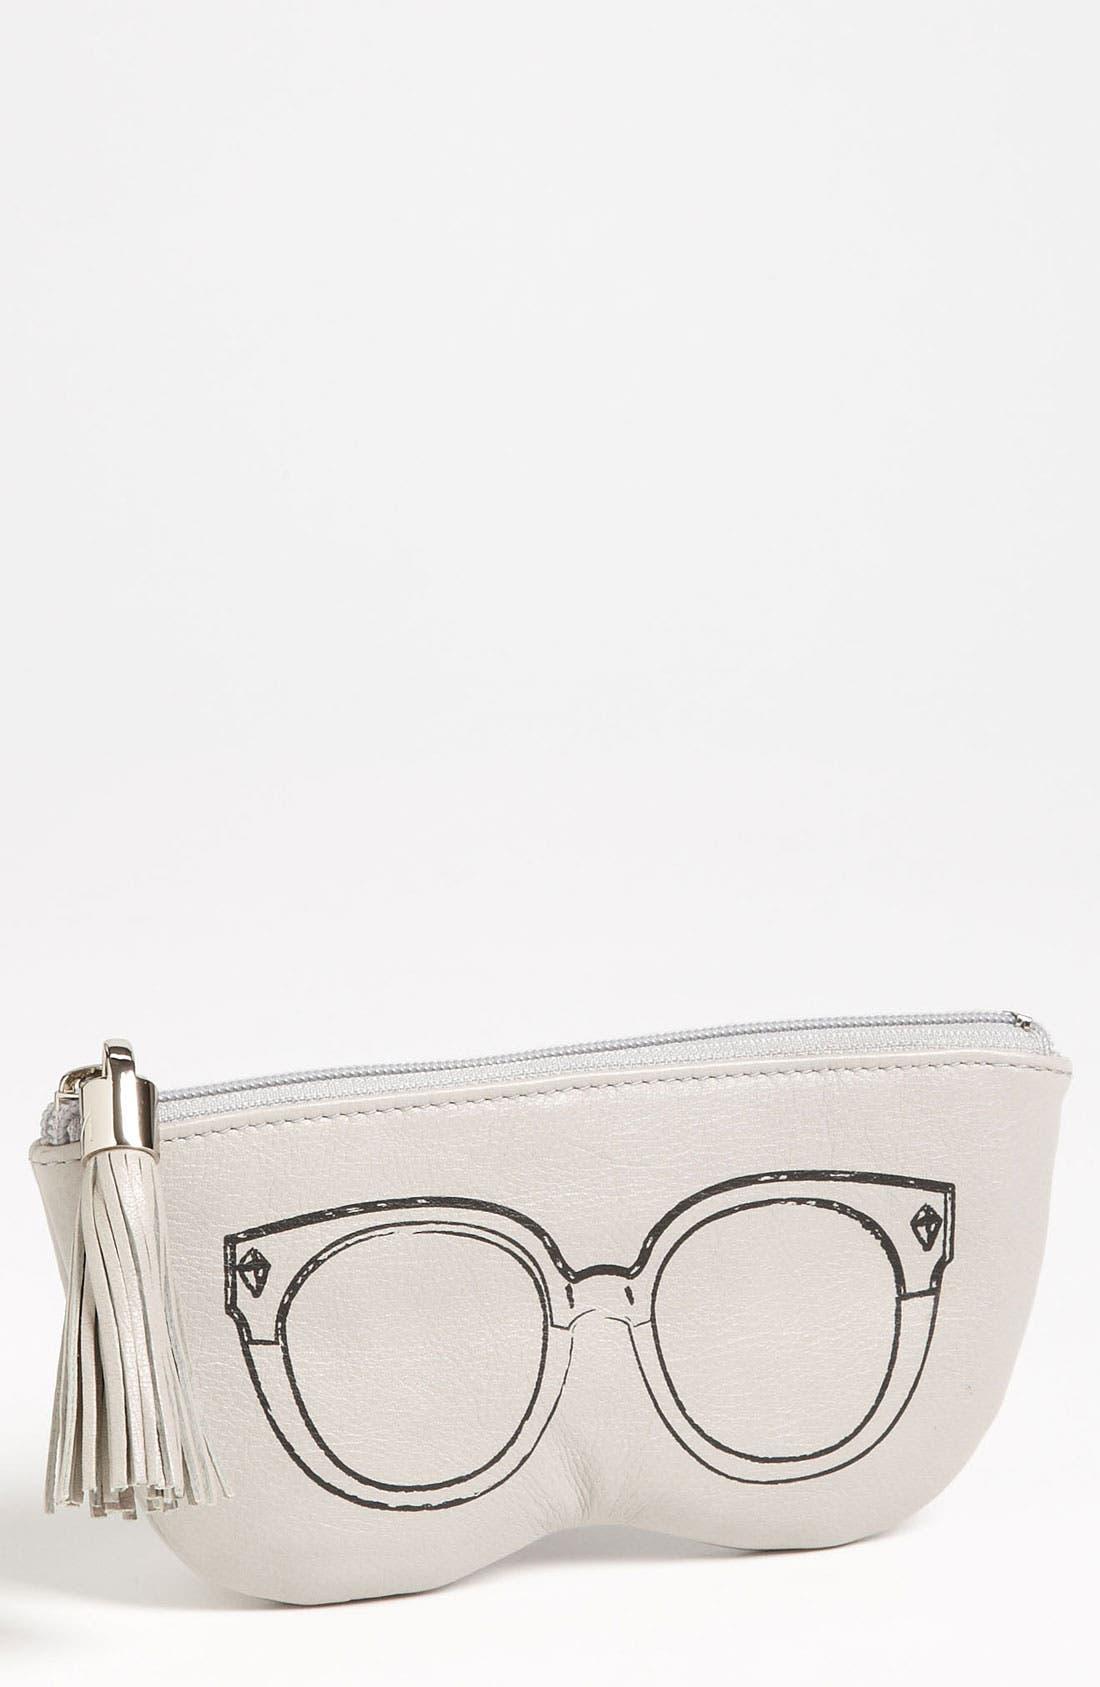 REBECCA MINKOFF, Leather Sunglasses Case, Main thumbnail 1, color, 020